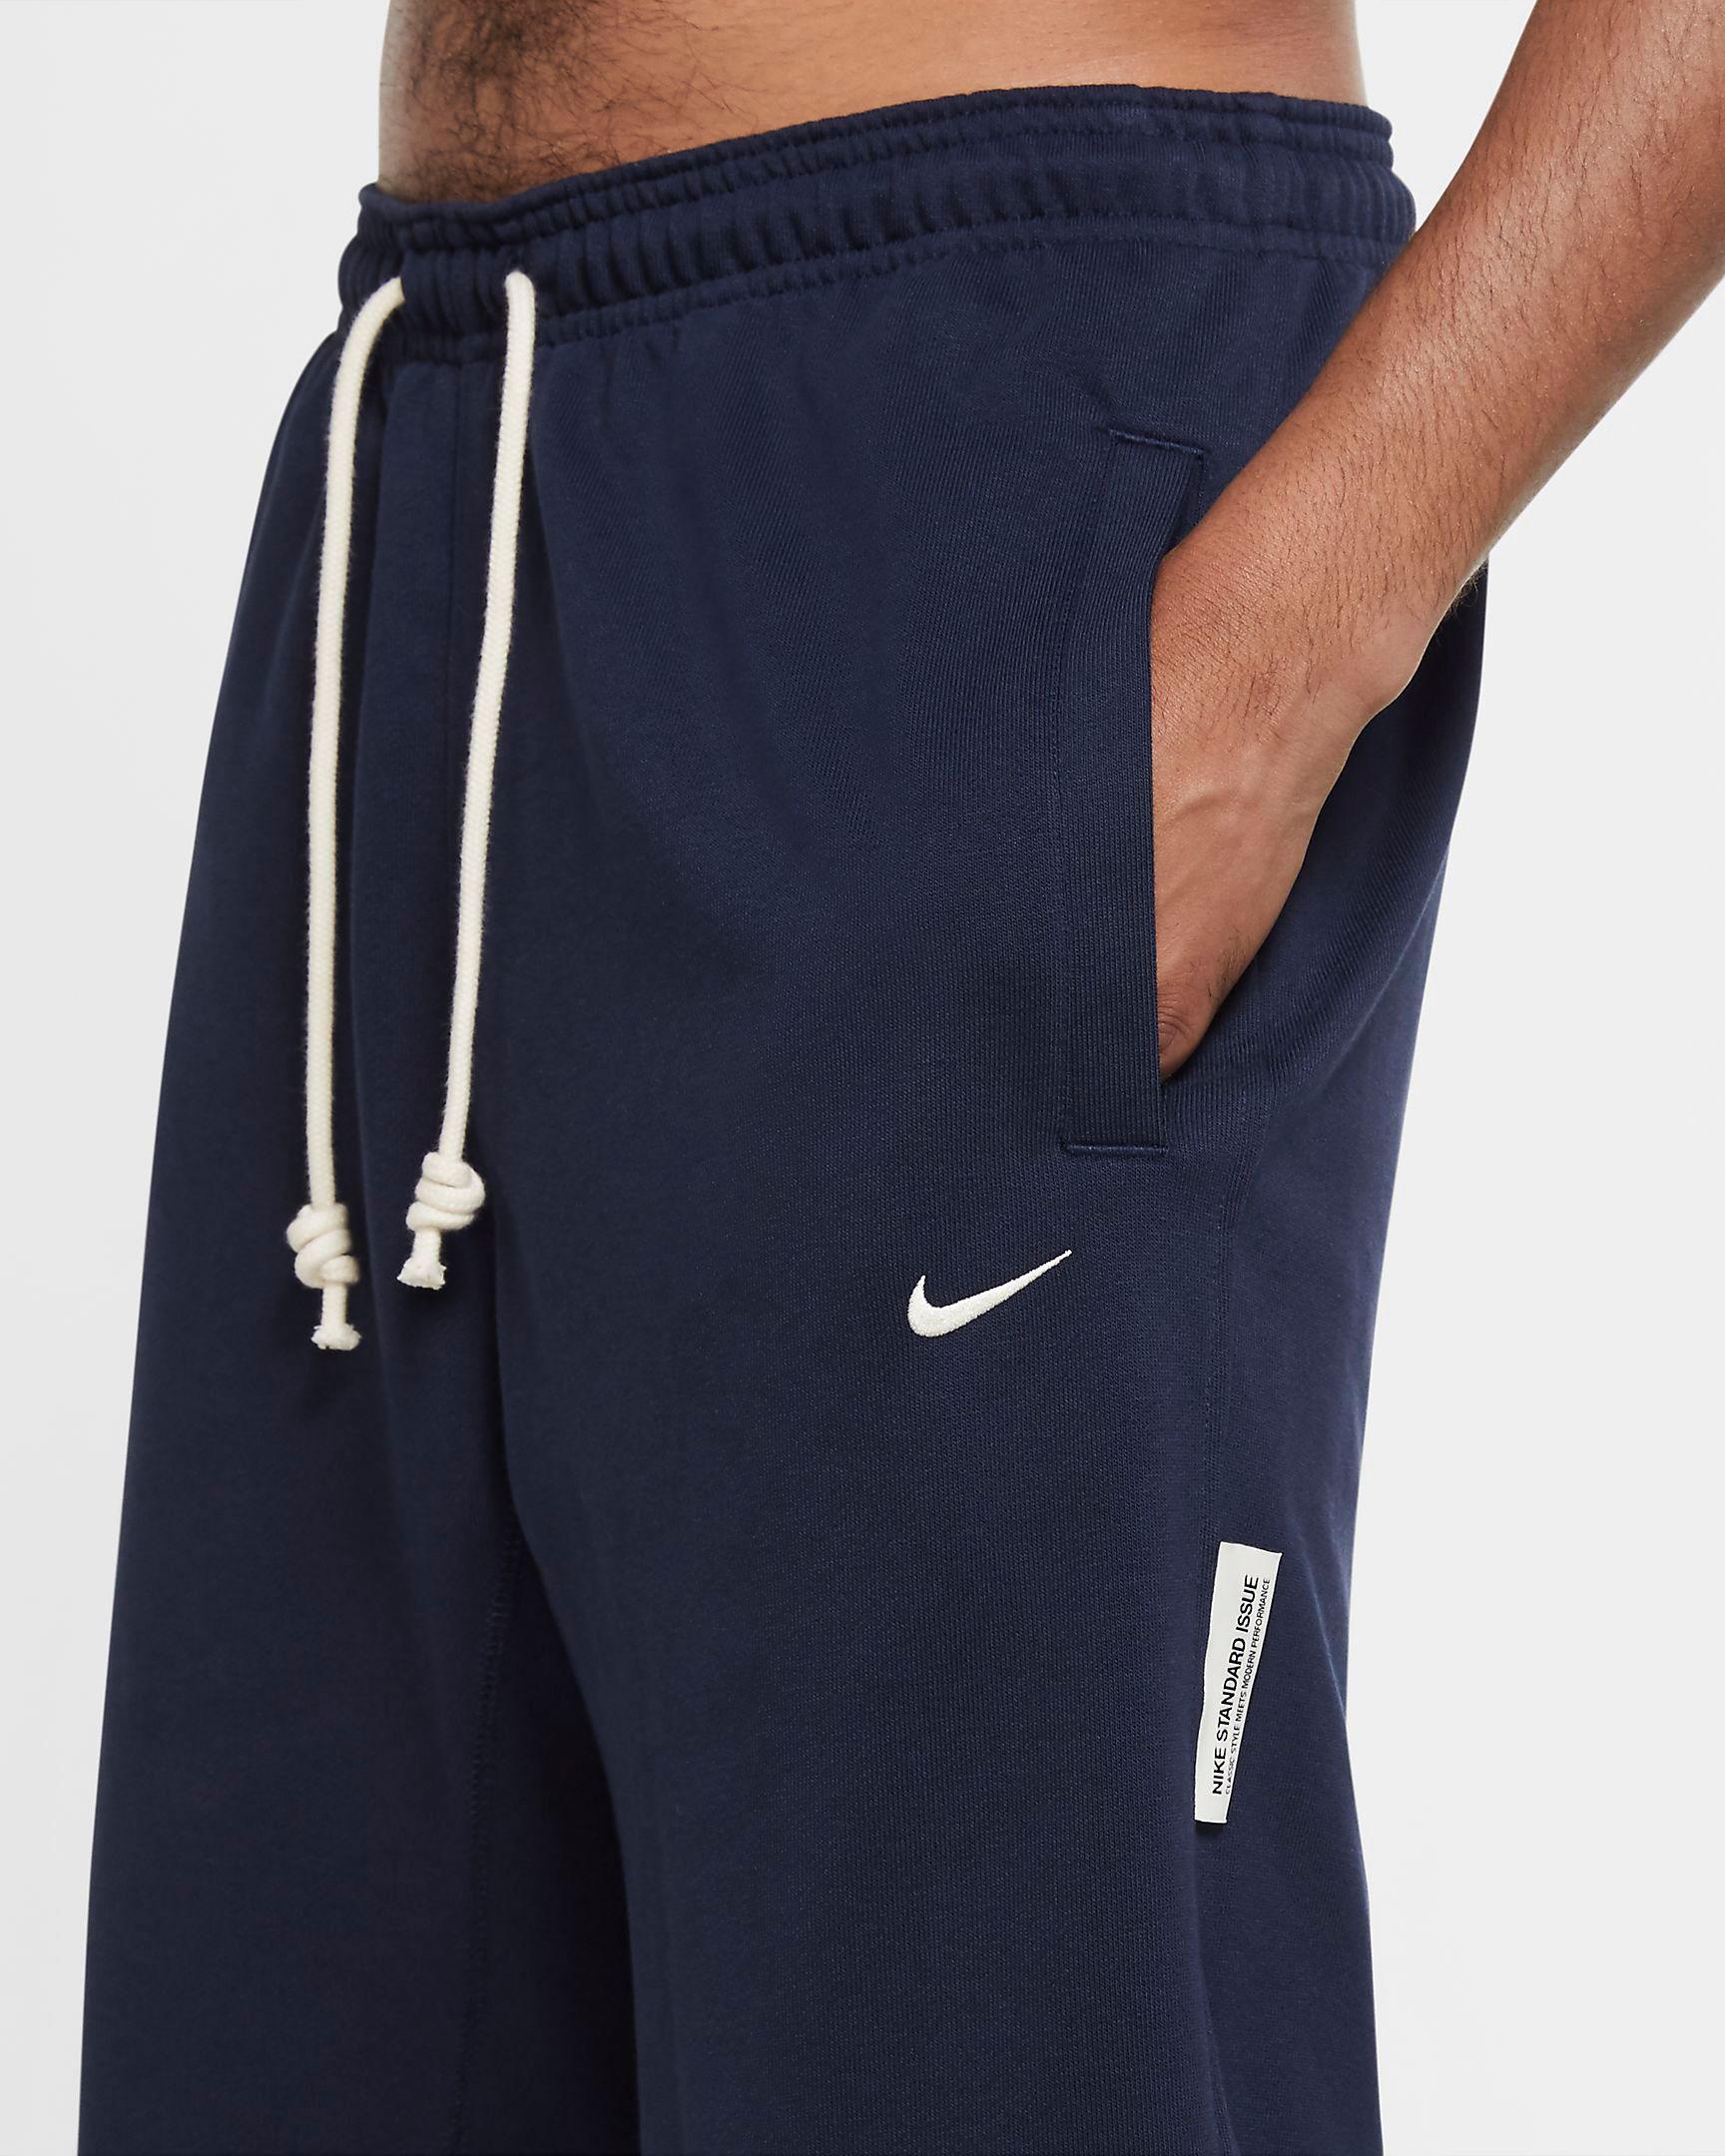 nike-lebron-17-graffiti-cold-blue-basketball-pants-1